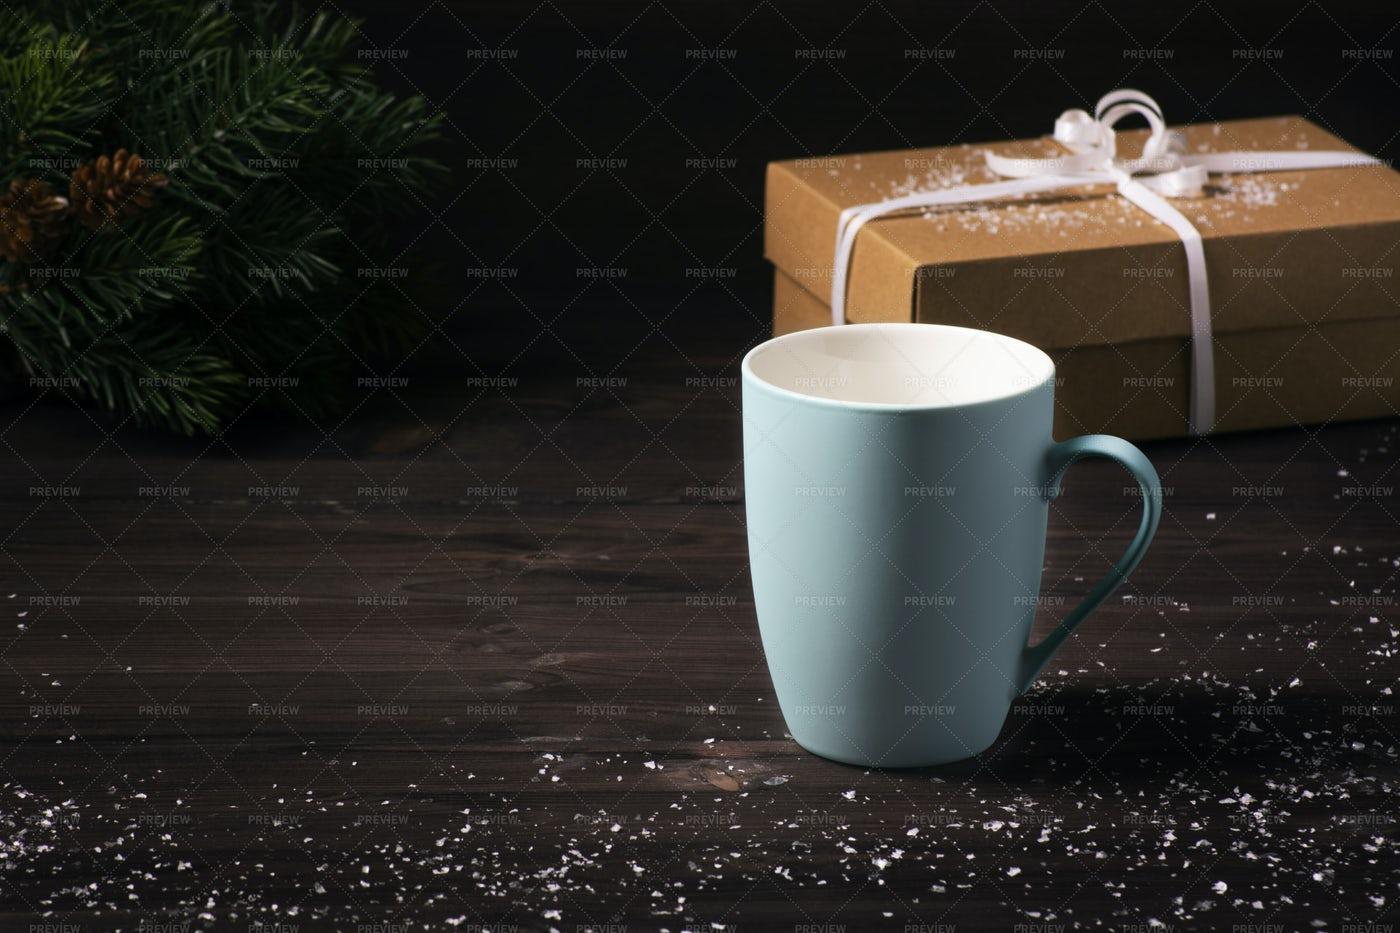 Blue Mug On Dark Wooden Background: Stock Photos